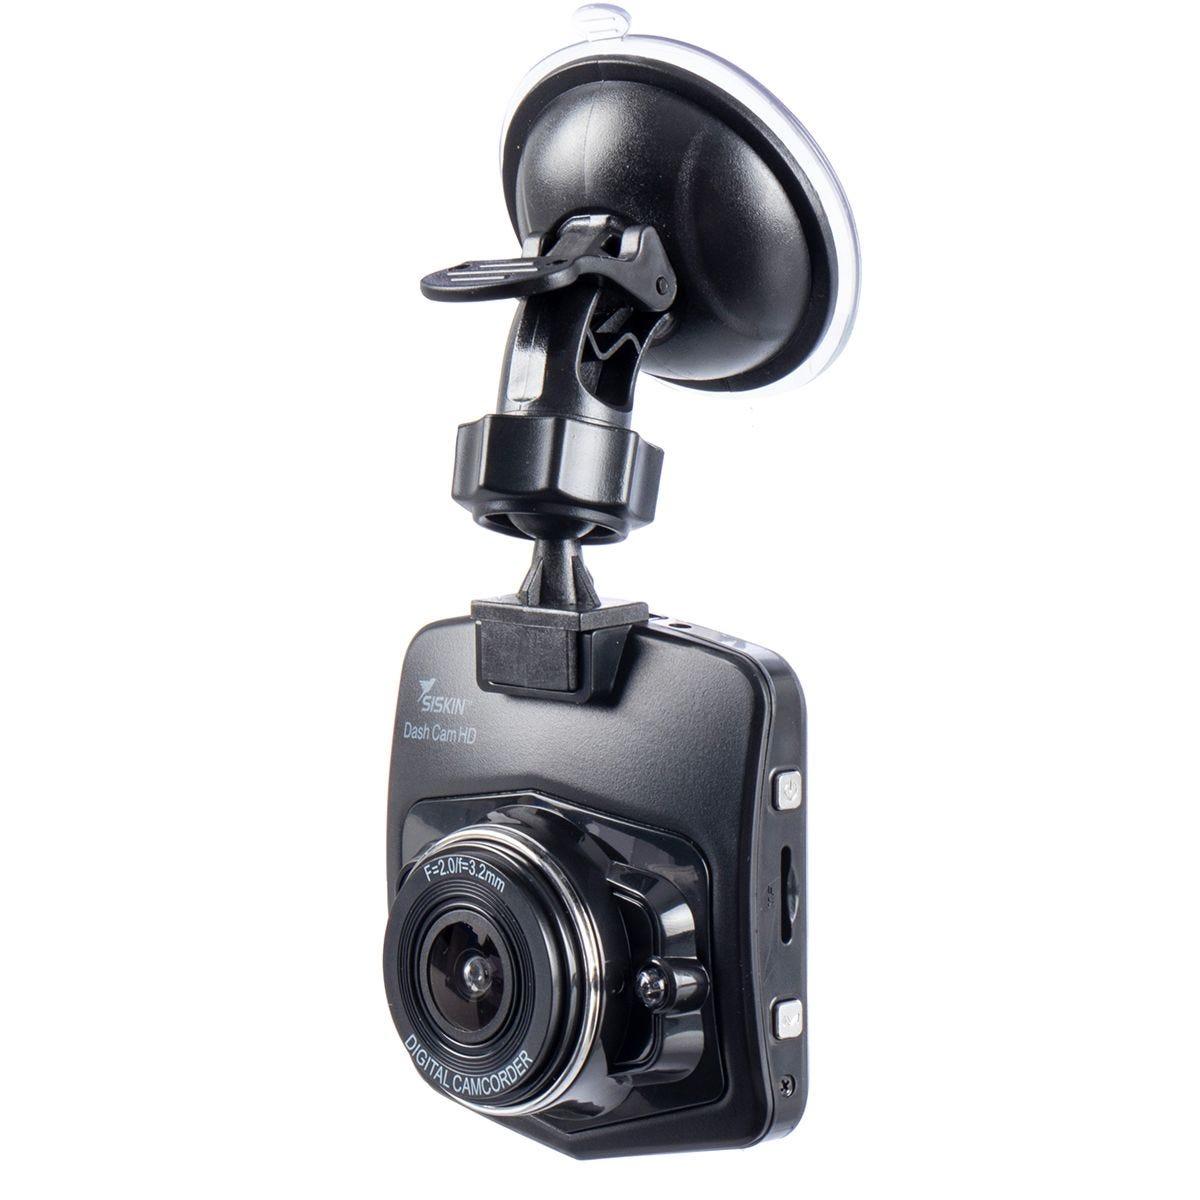 Siskin HD 720p Dashboard Camera with 2.5